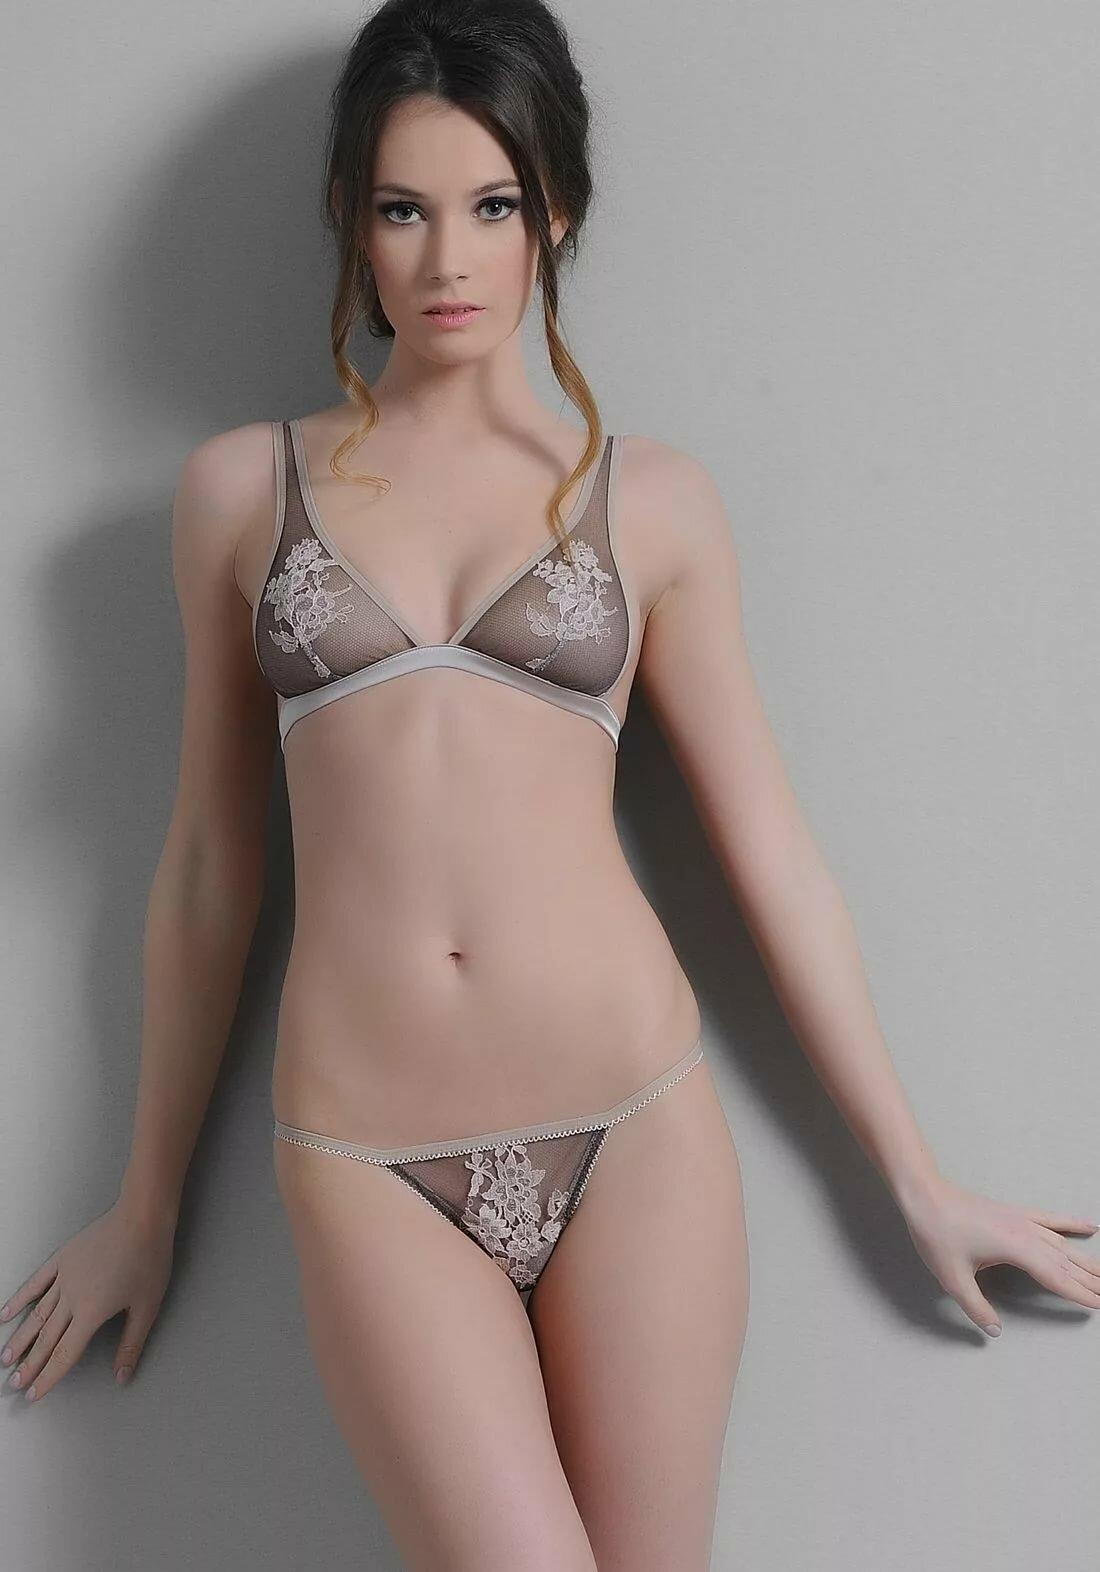 petite-female-models-nude-ultimate-lesbian-orgasm